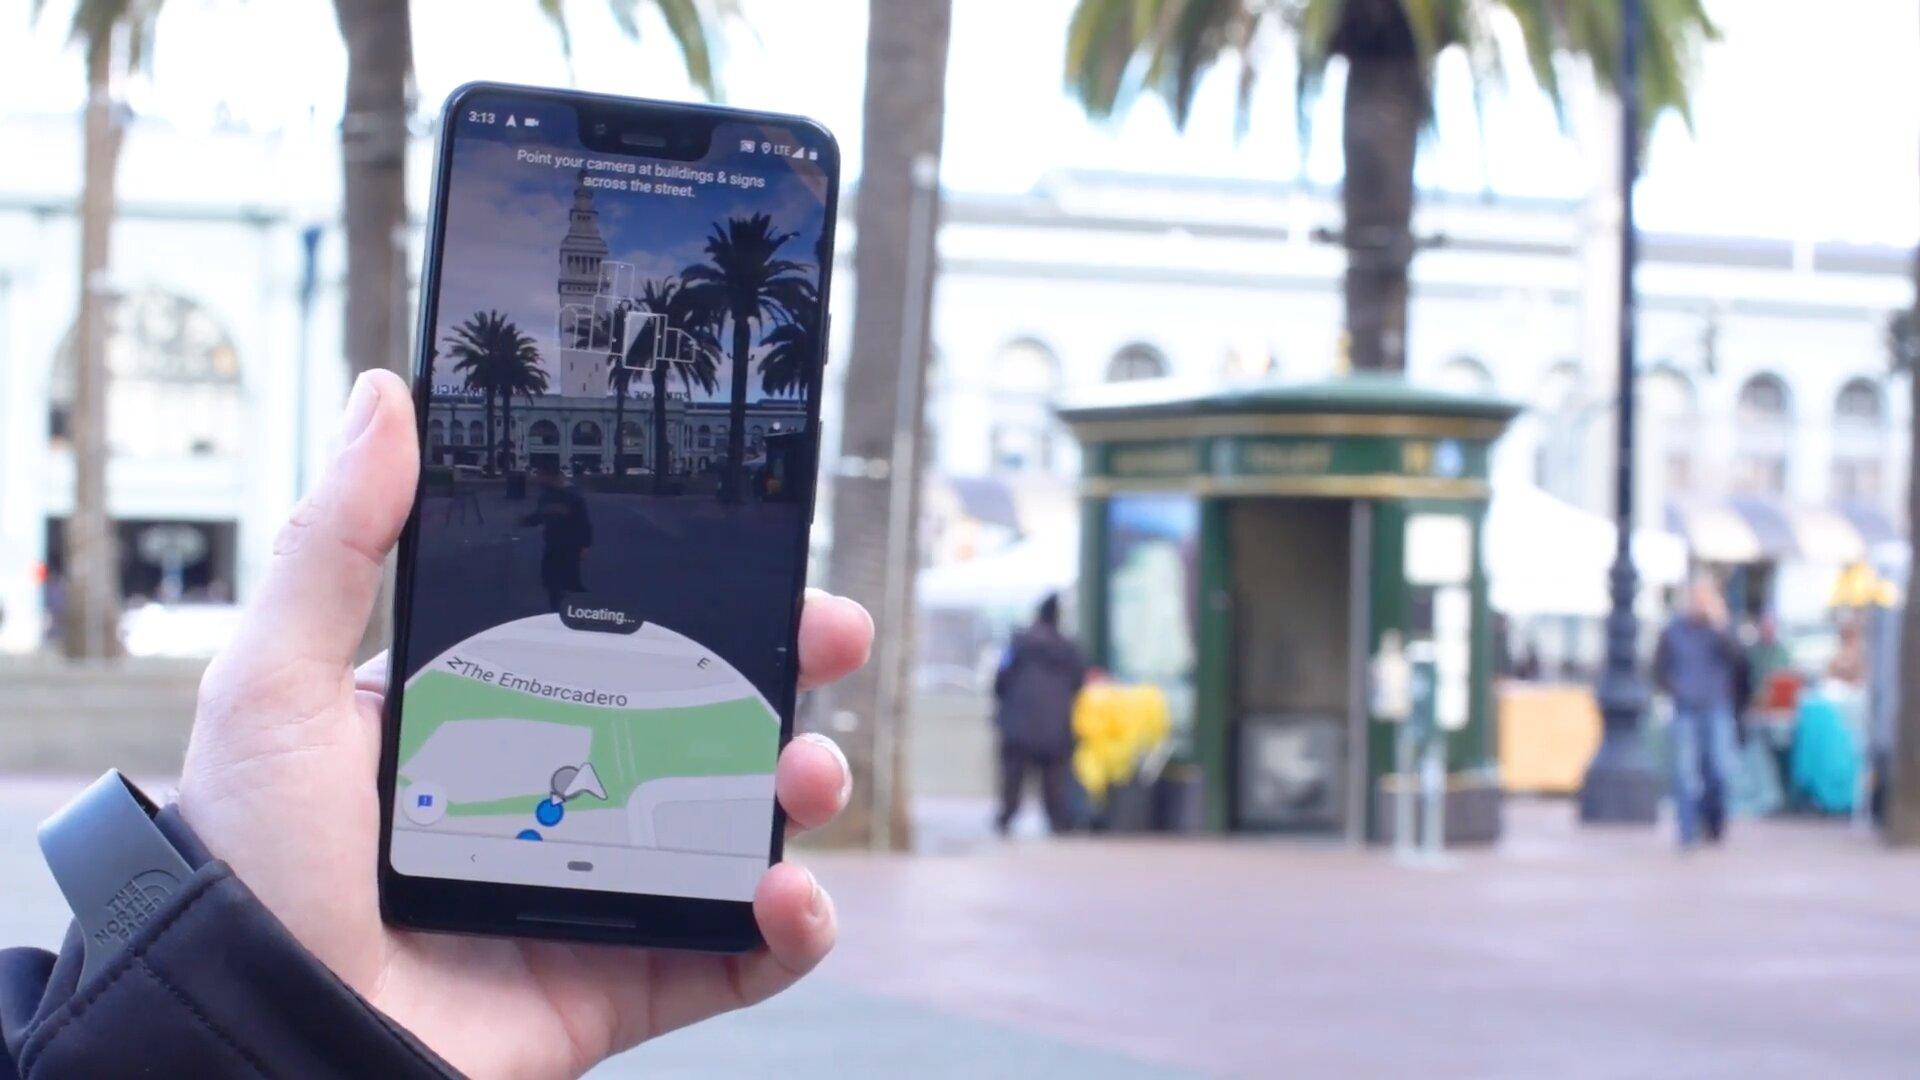 Google Maps muss zunächst die Umgebung erkennen